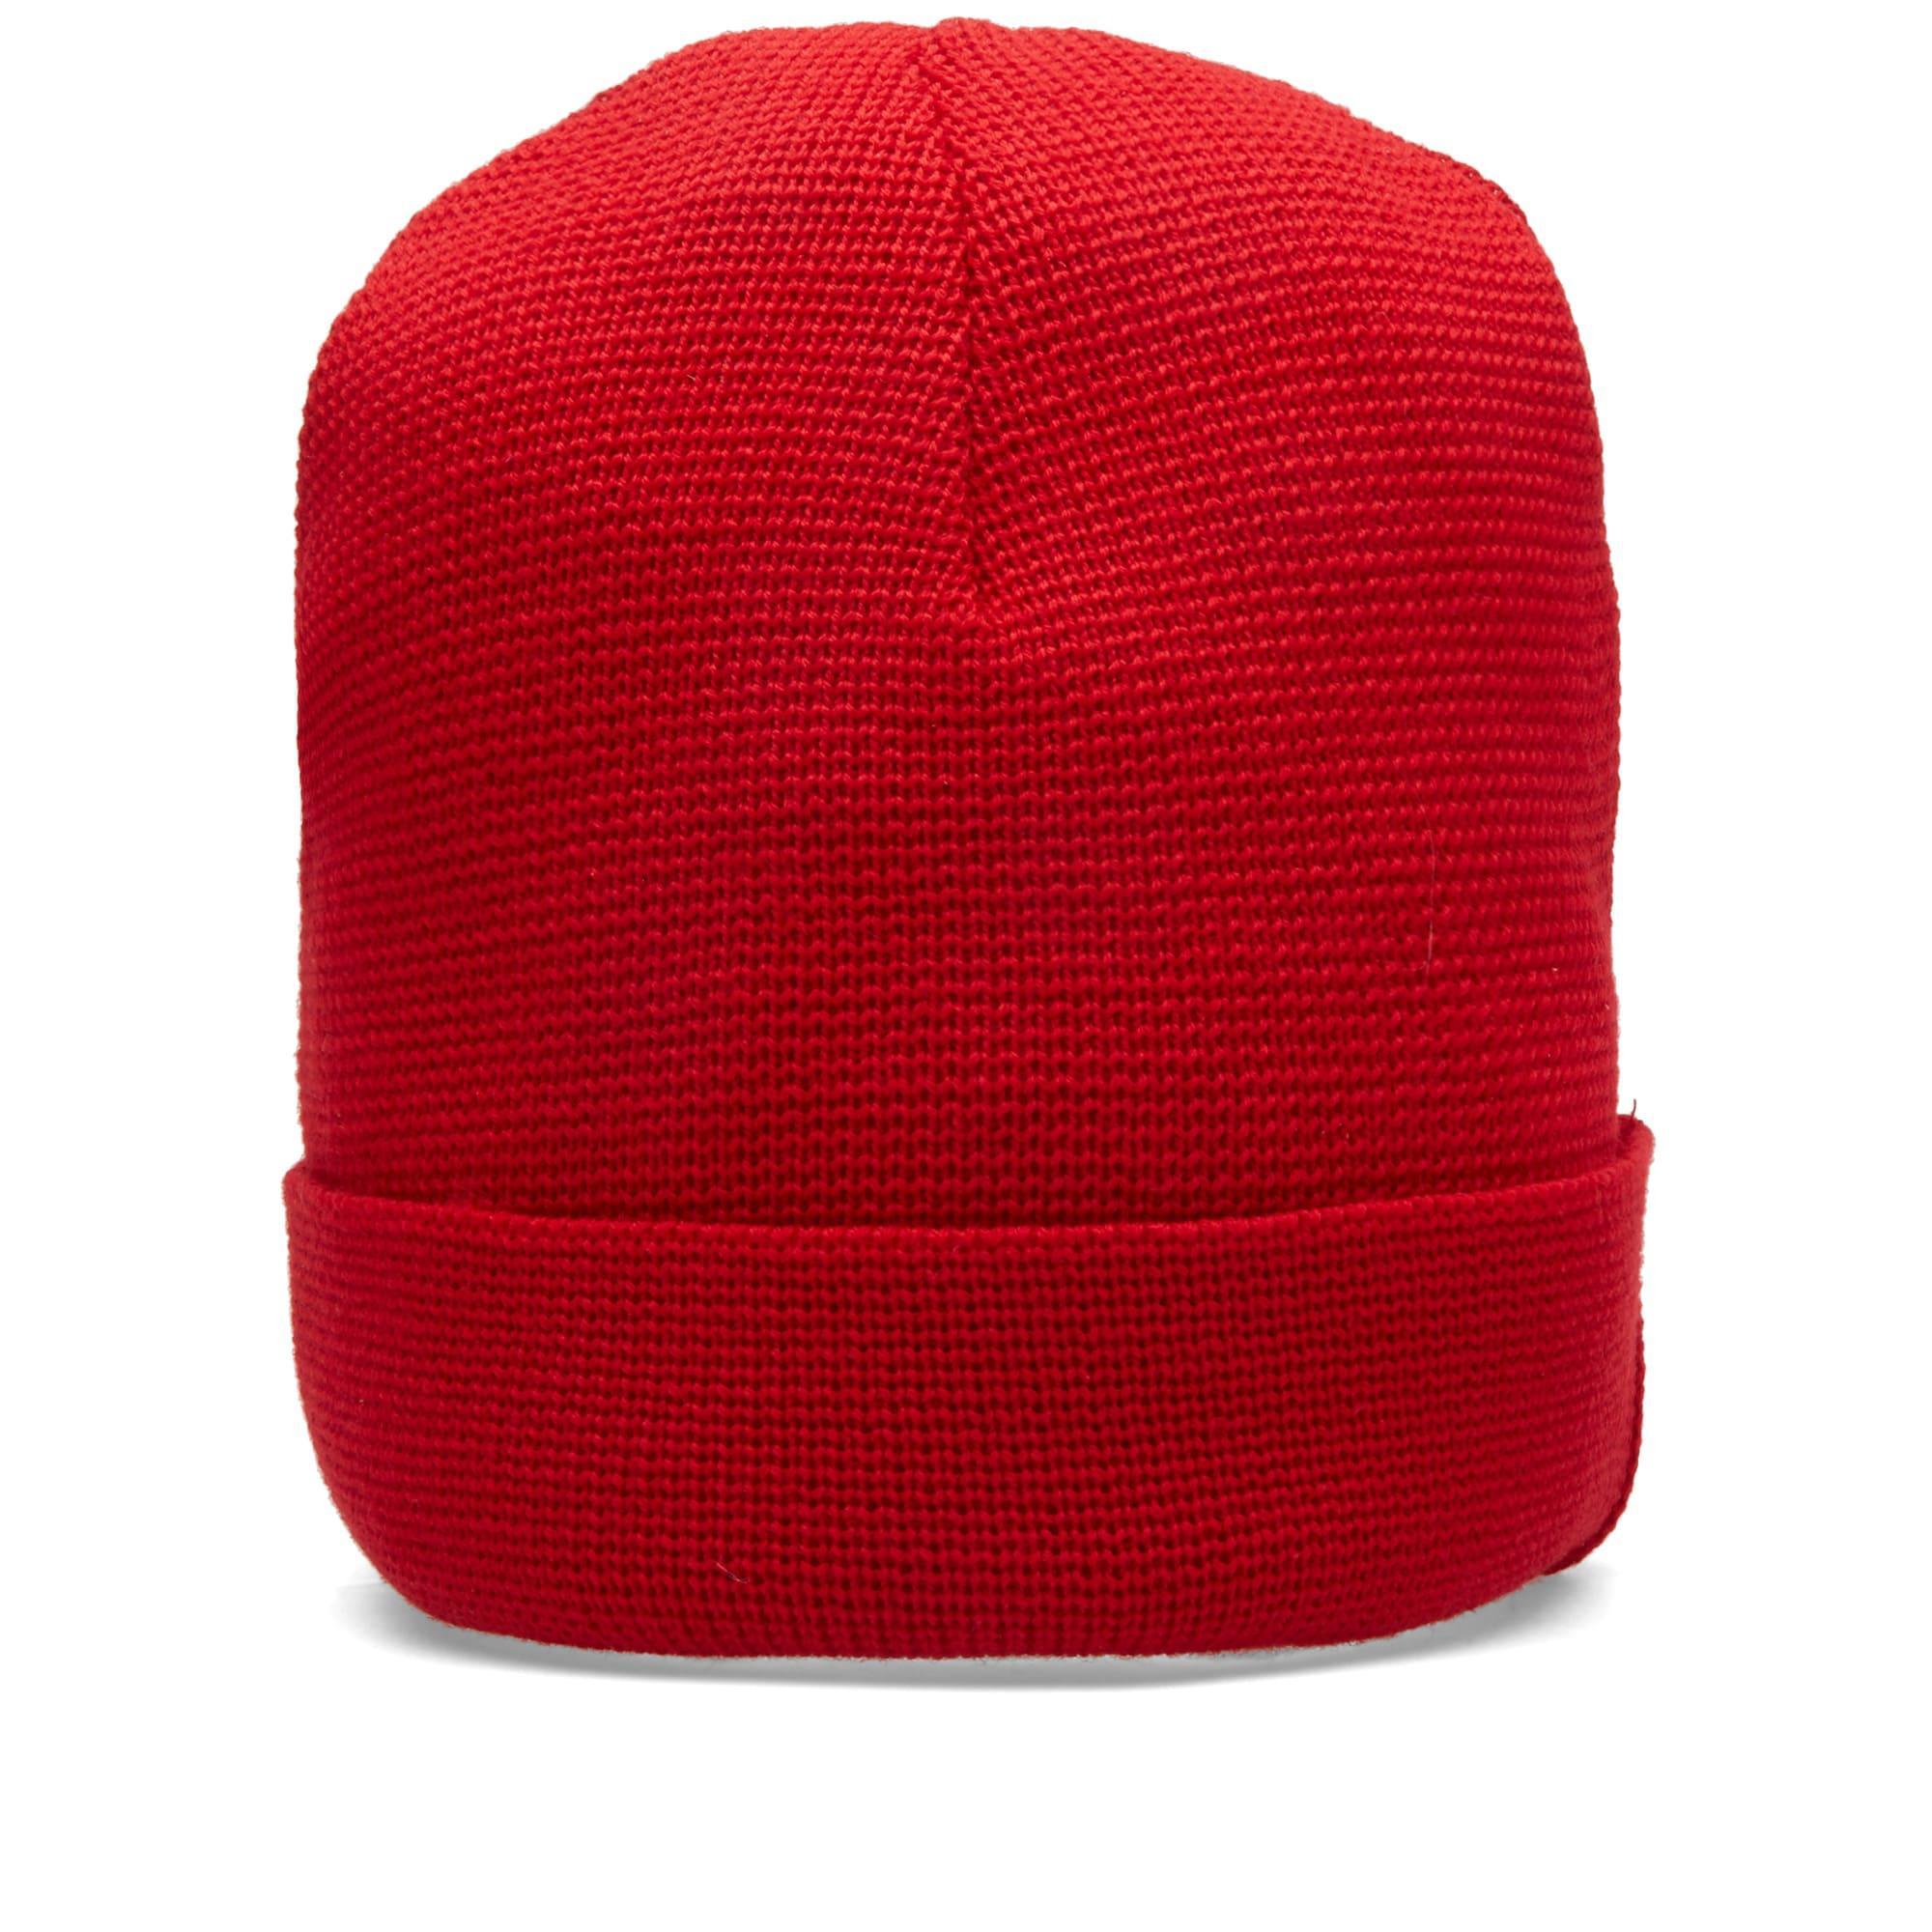 ce4ff9f0be8 Ami Alexandre Mattiussi Ami Wool Beanie In Red